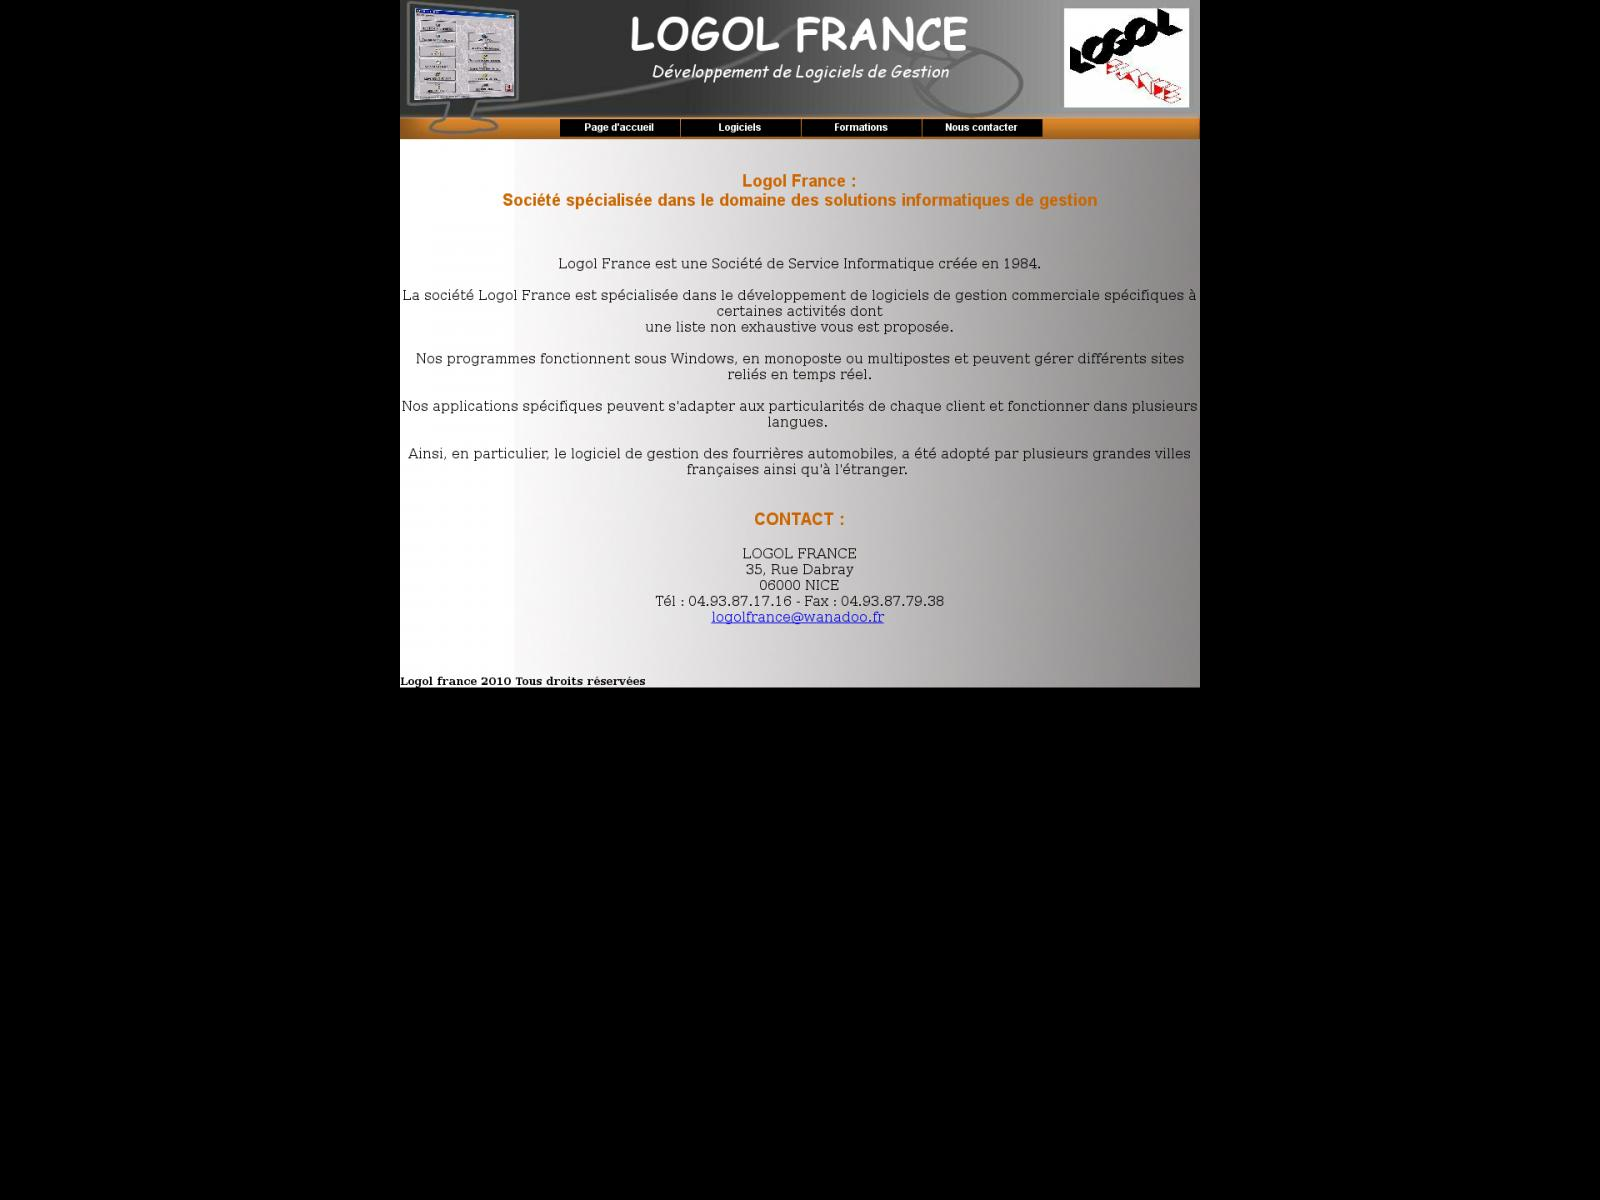 LOGOL FRANCE NICE